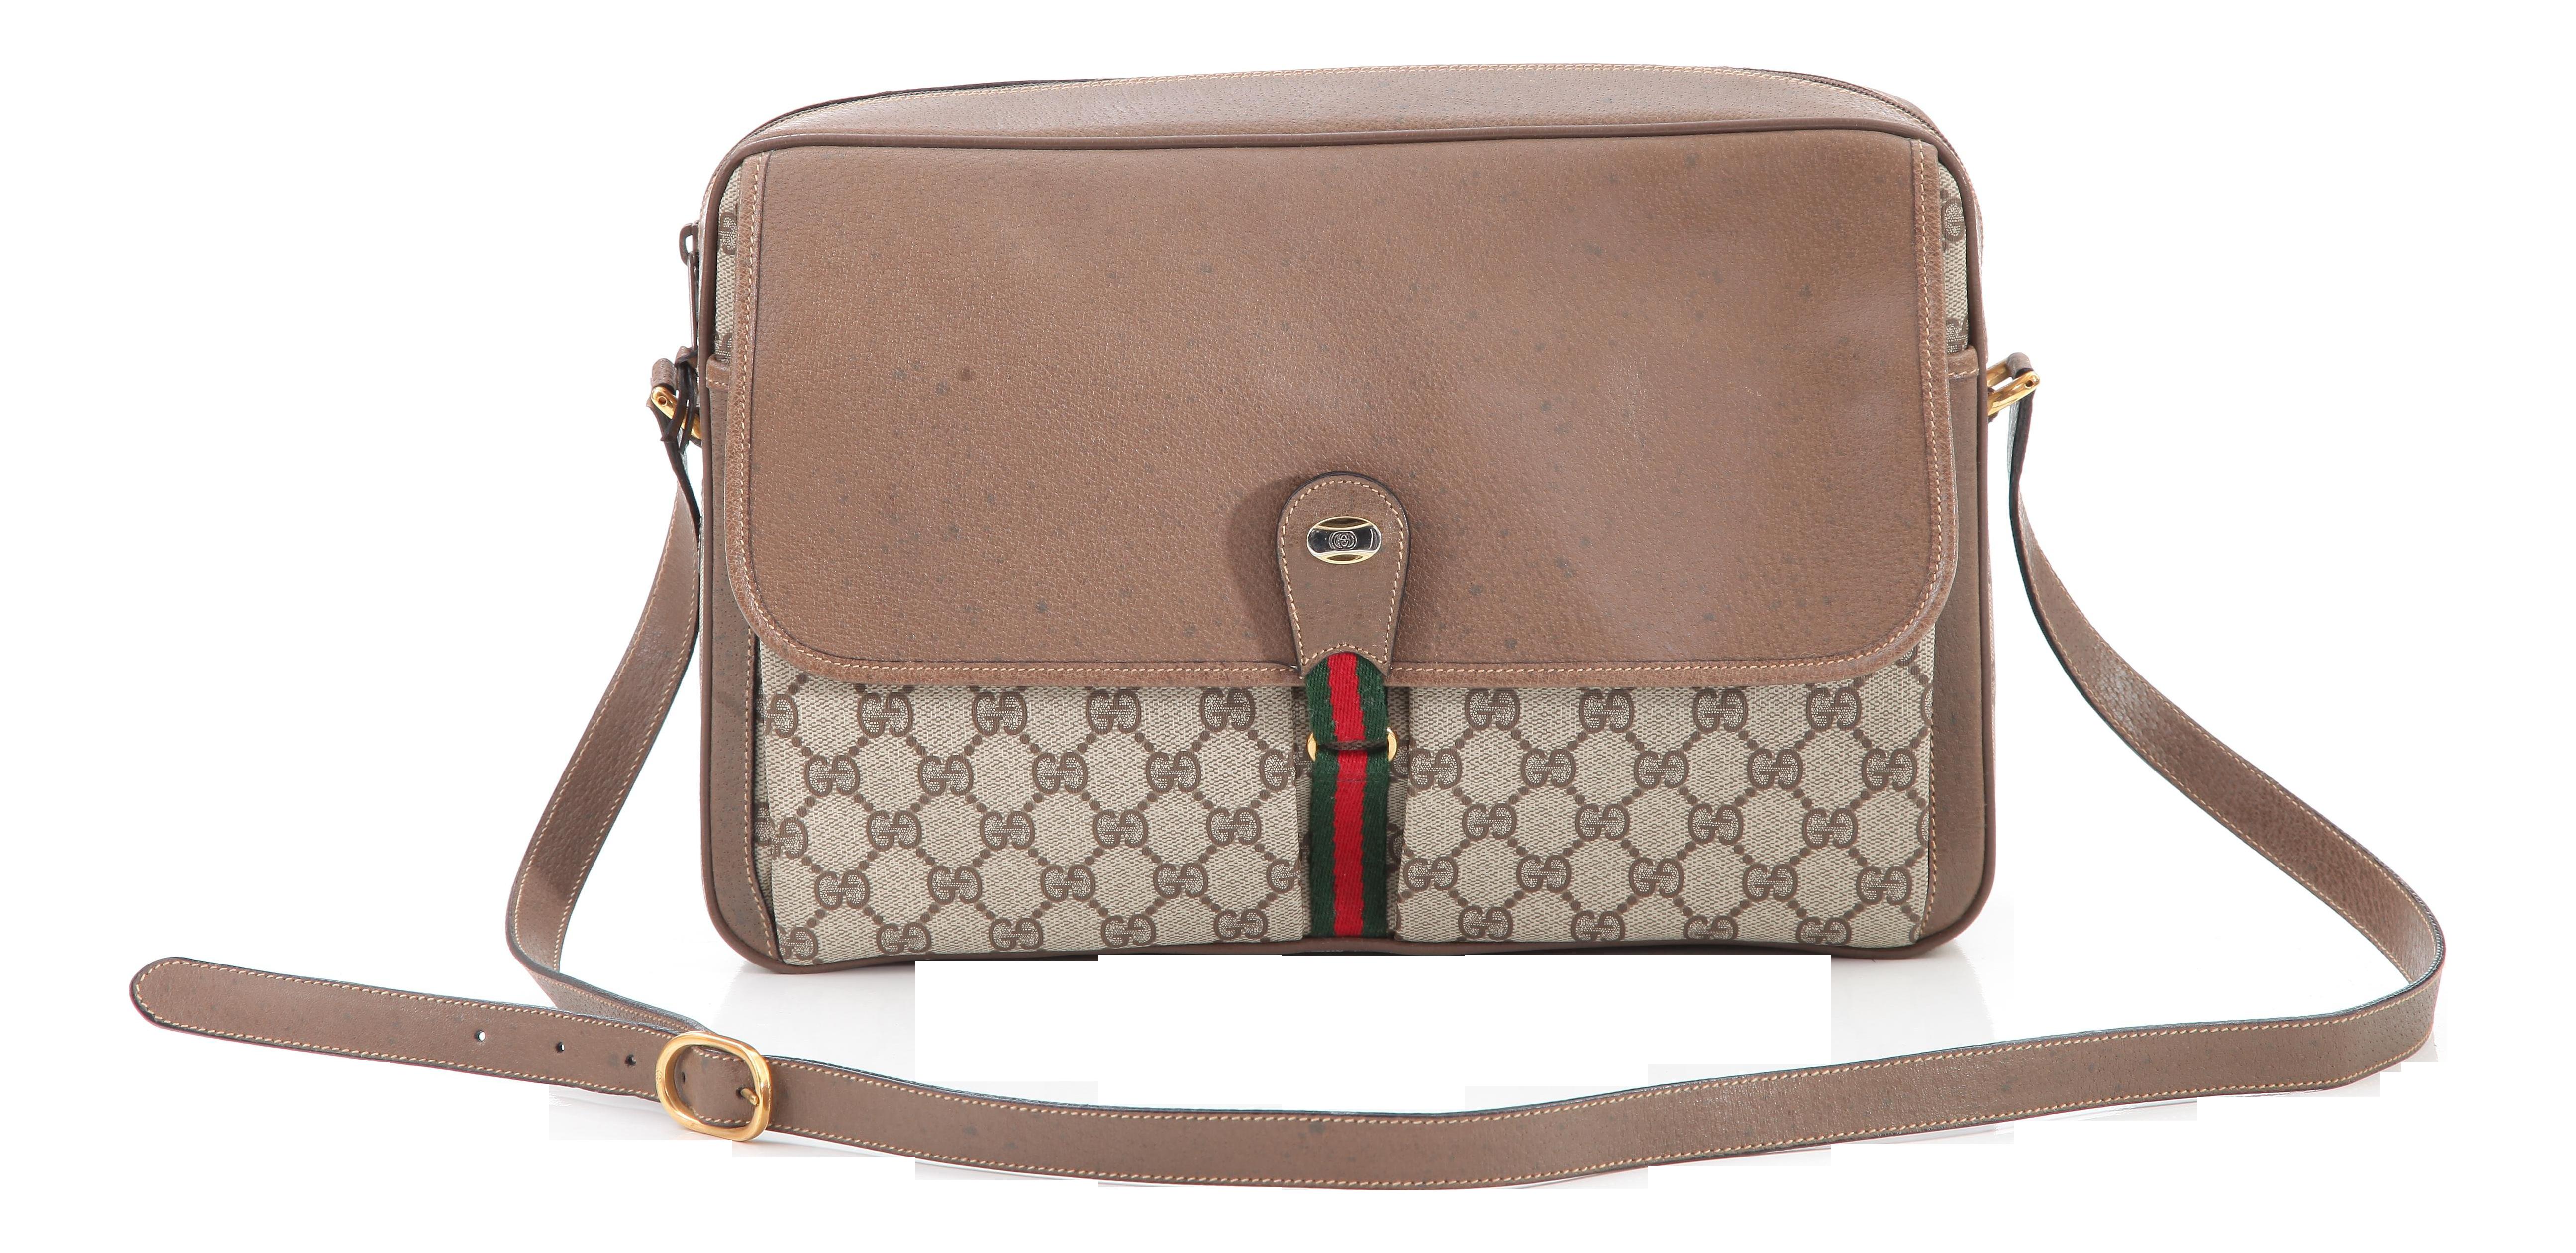 324b3f6814c3 Vintage Gucci Satchel Bag – Hanna Oaks